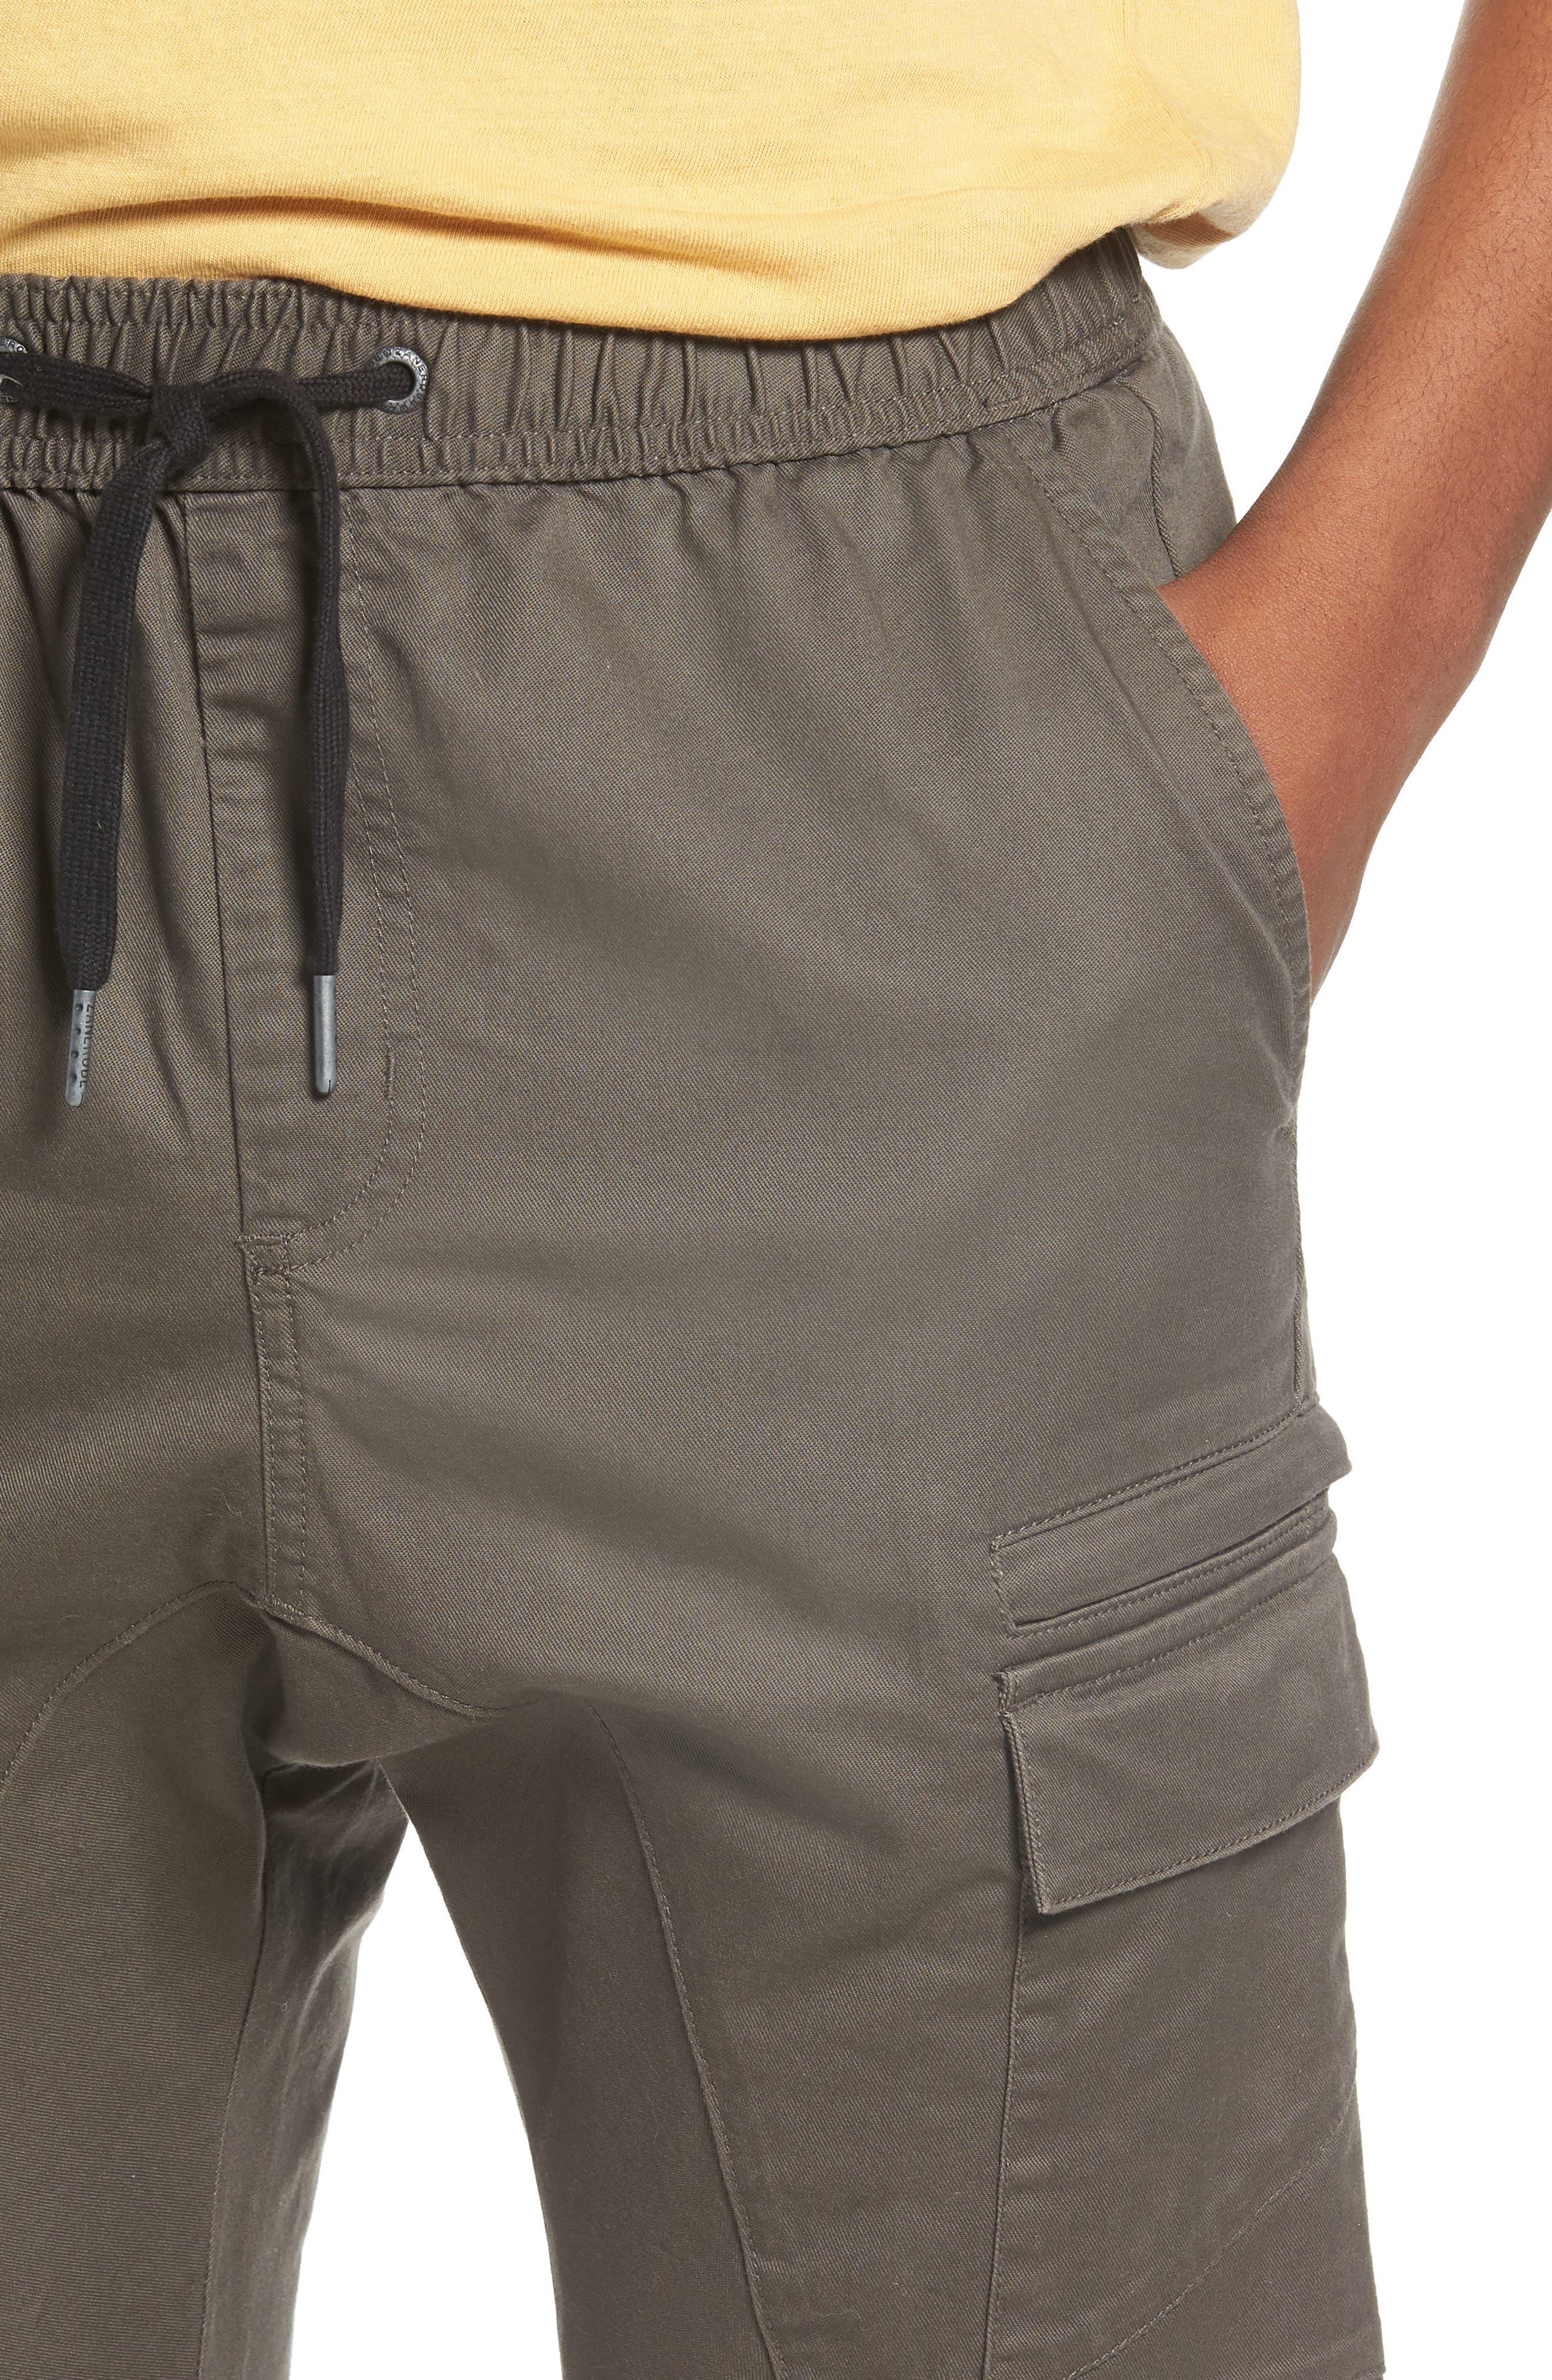 Sureshot Cargo Shorts,                             Alternate thumbnail 4, color,                             Peat